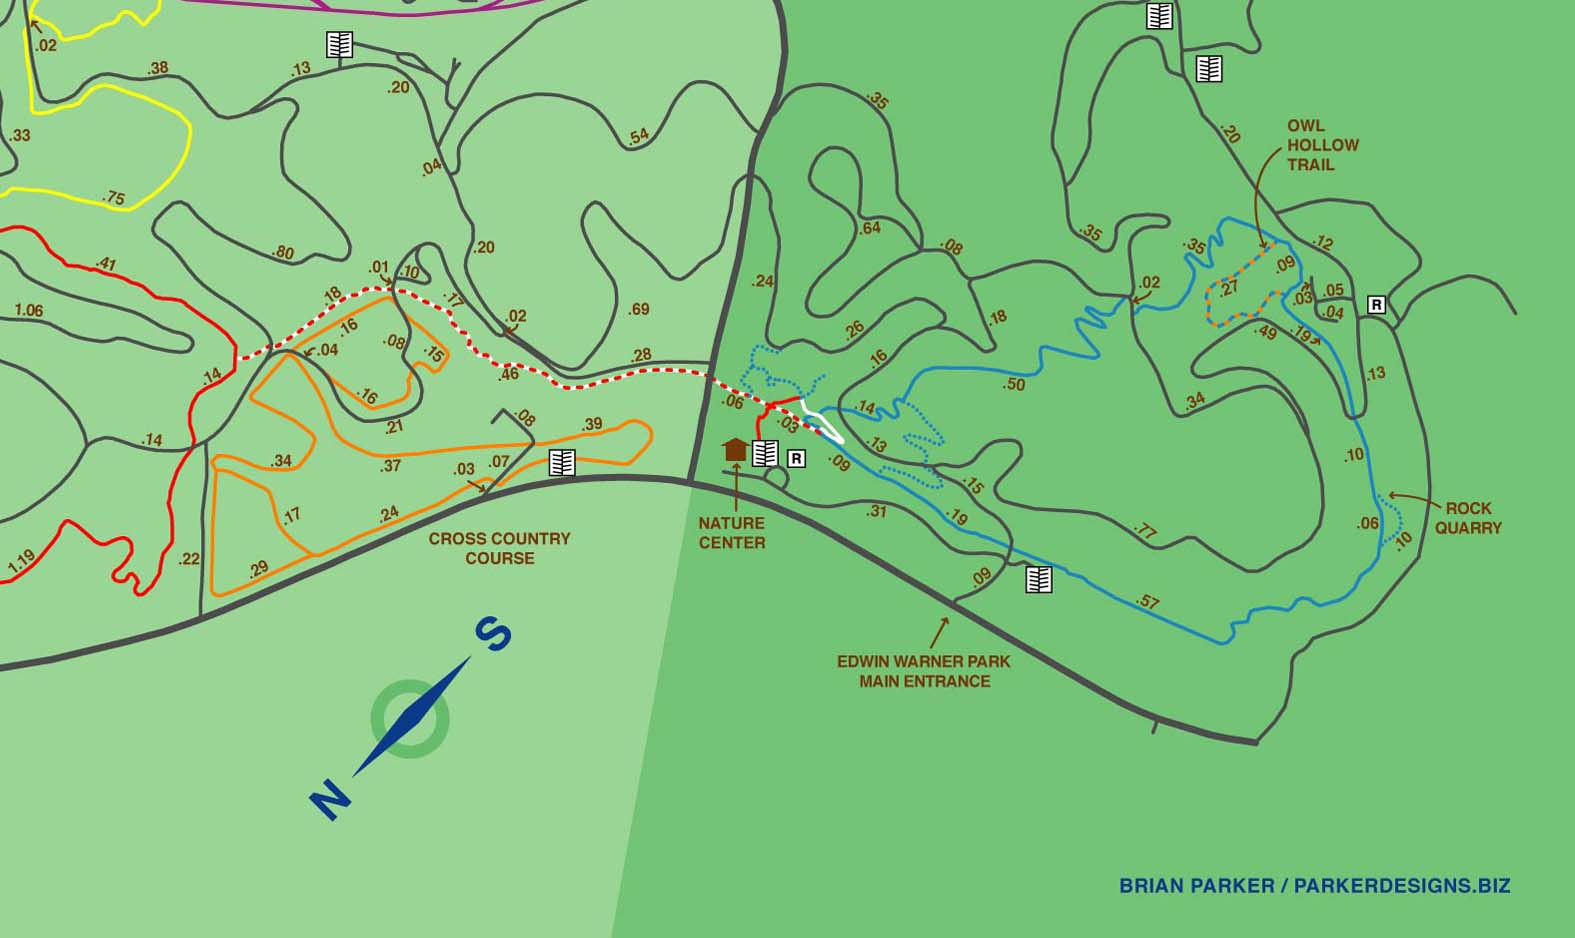 Maps of the Warner Parks